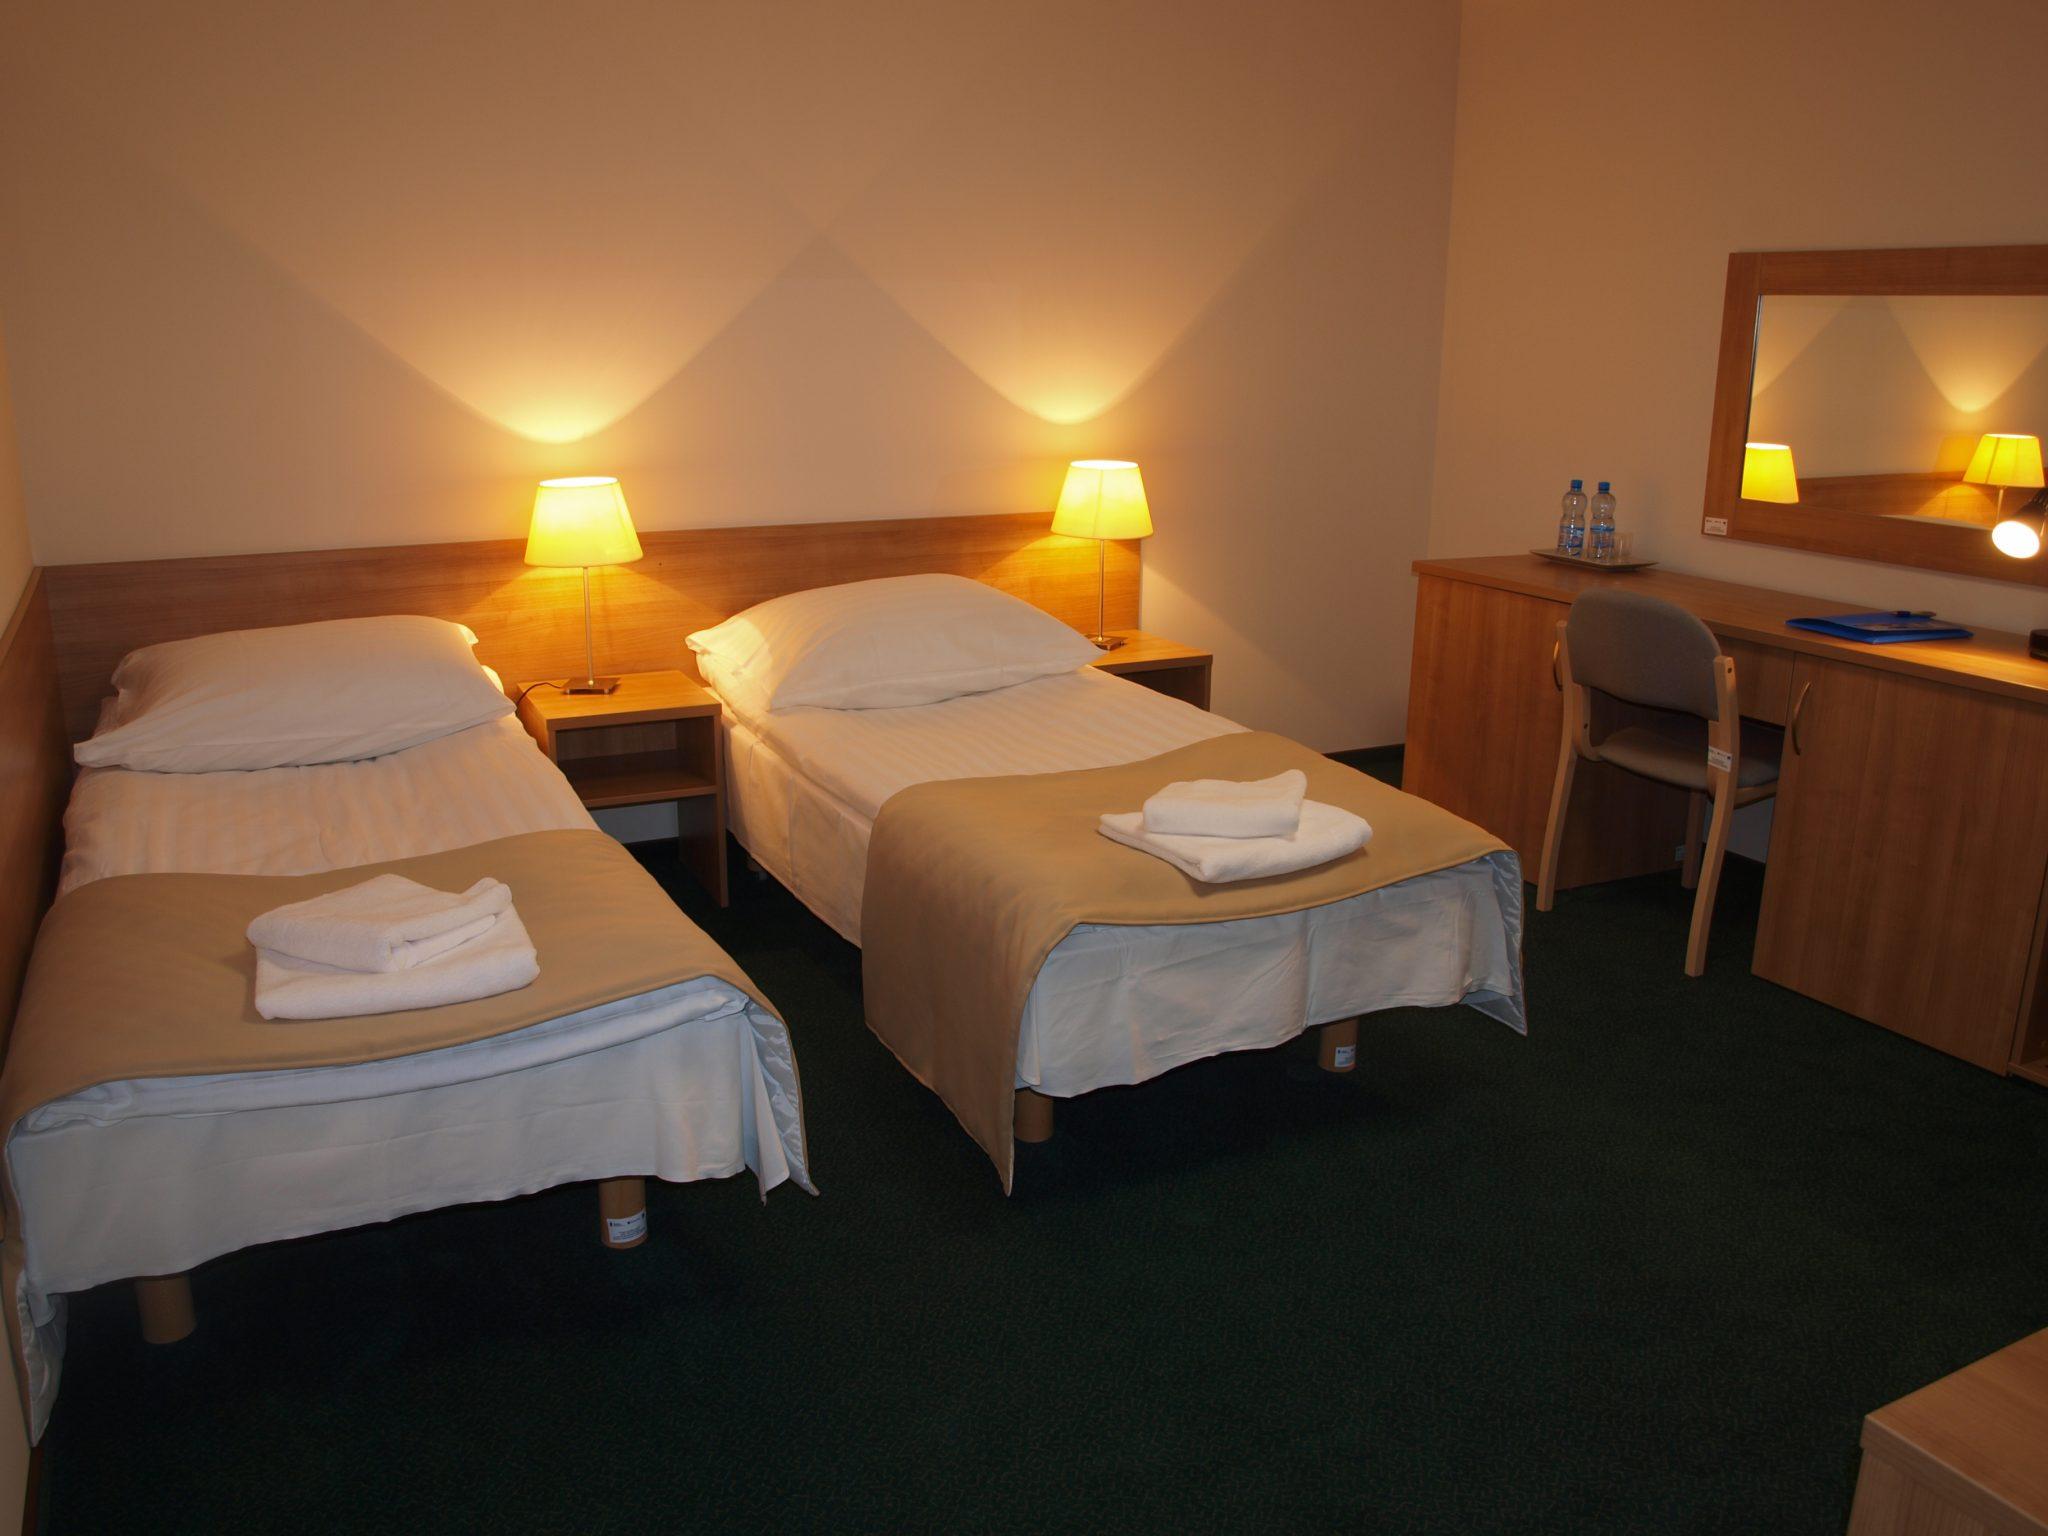 Swimming camps Oświęcim - hotel bedroom - Road to Sport